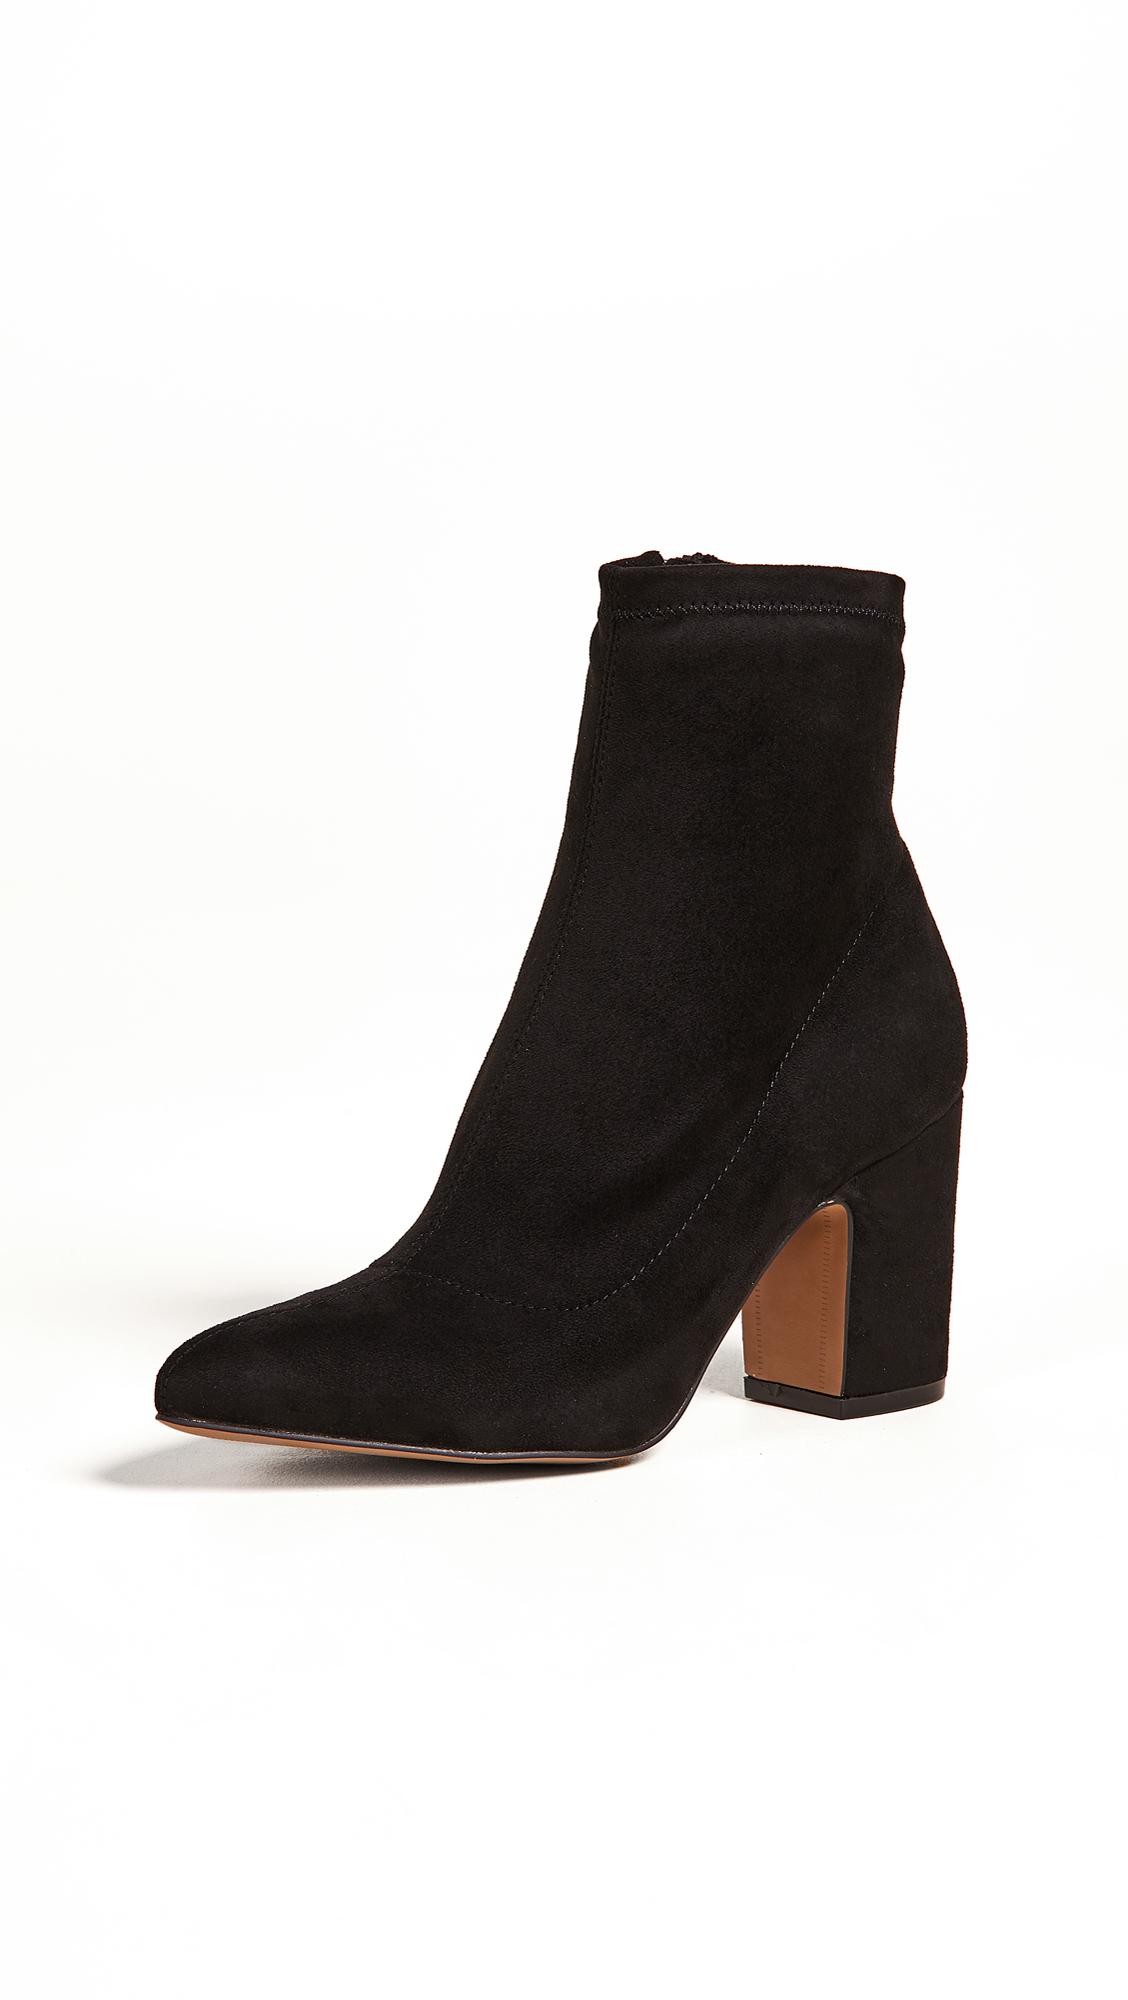 STEVEN Leandra Block Heel Ankle Booties in Black